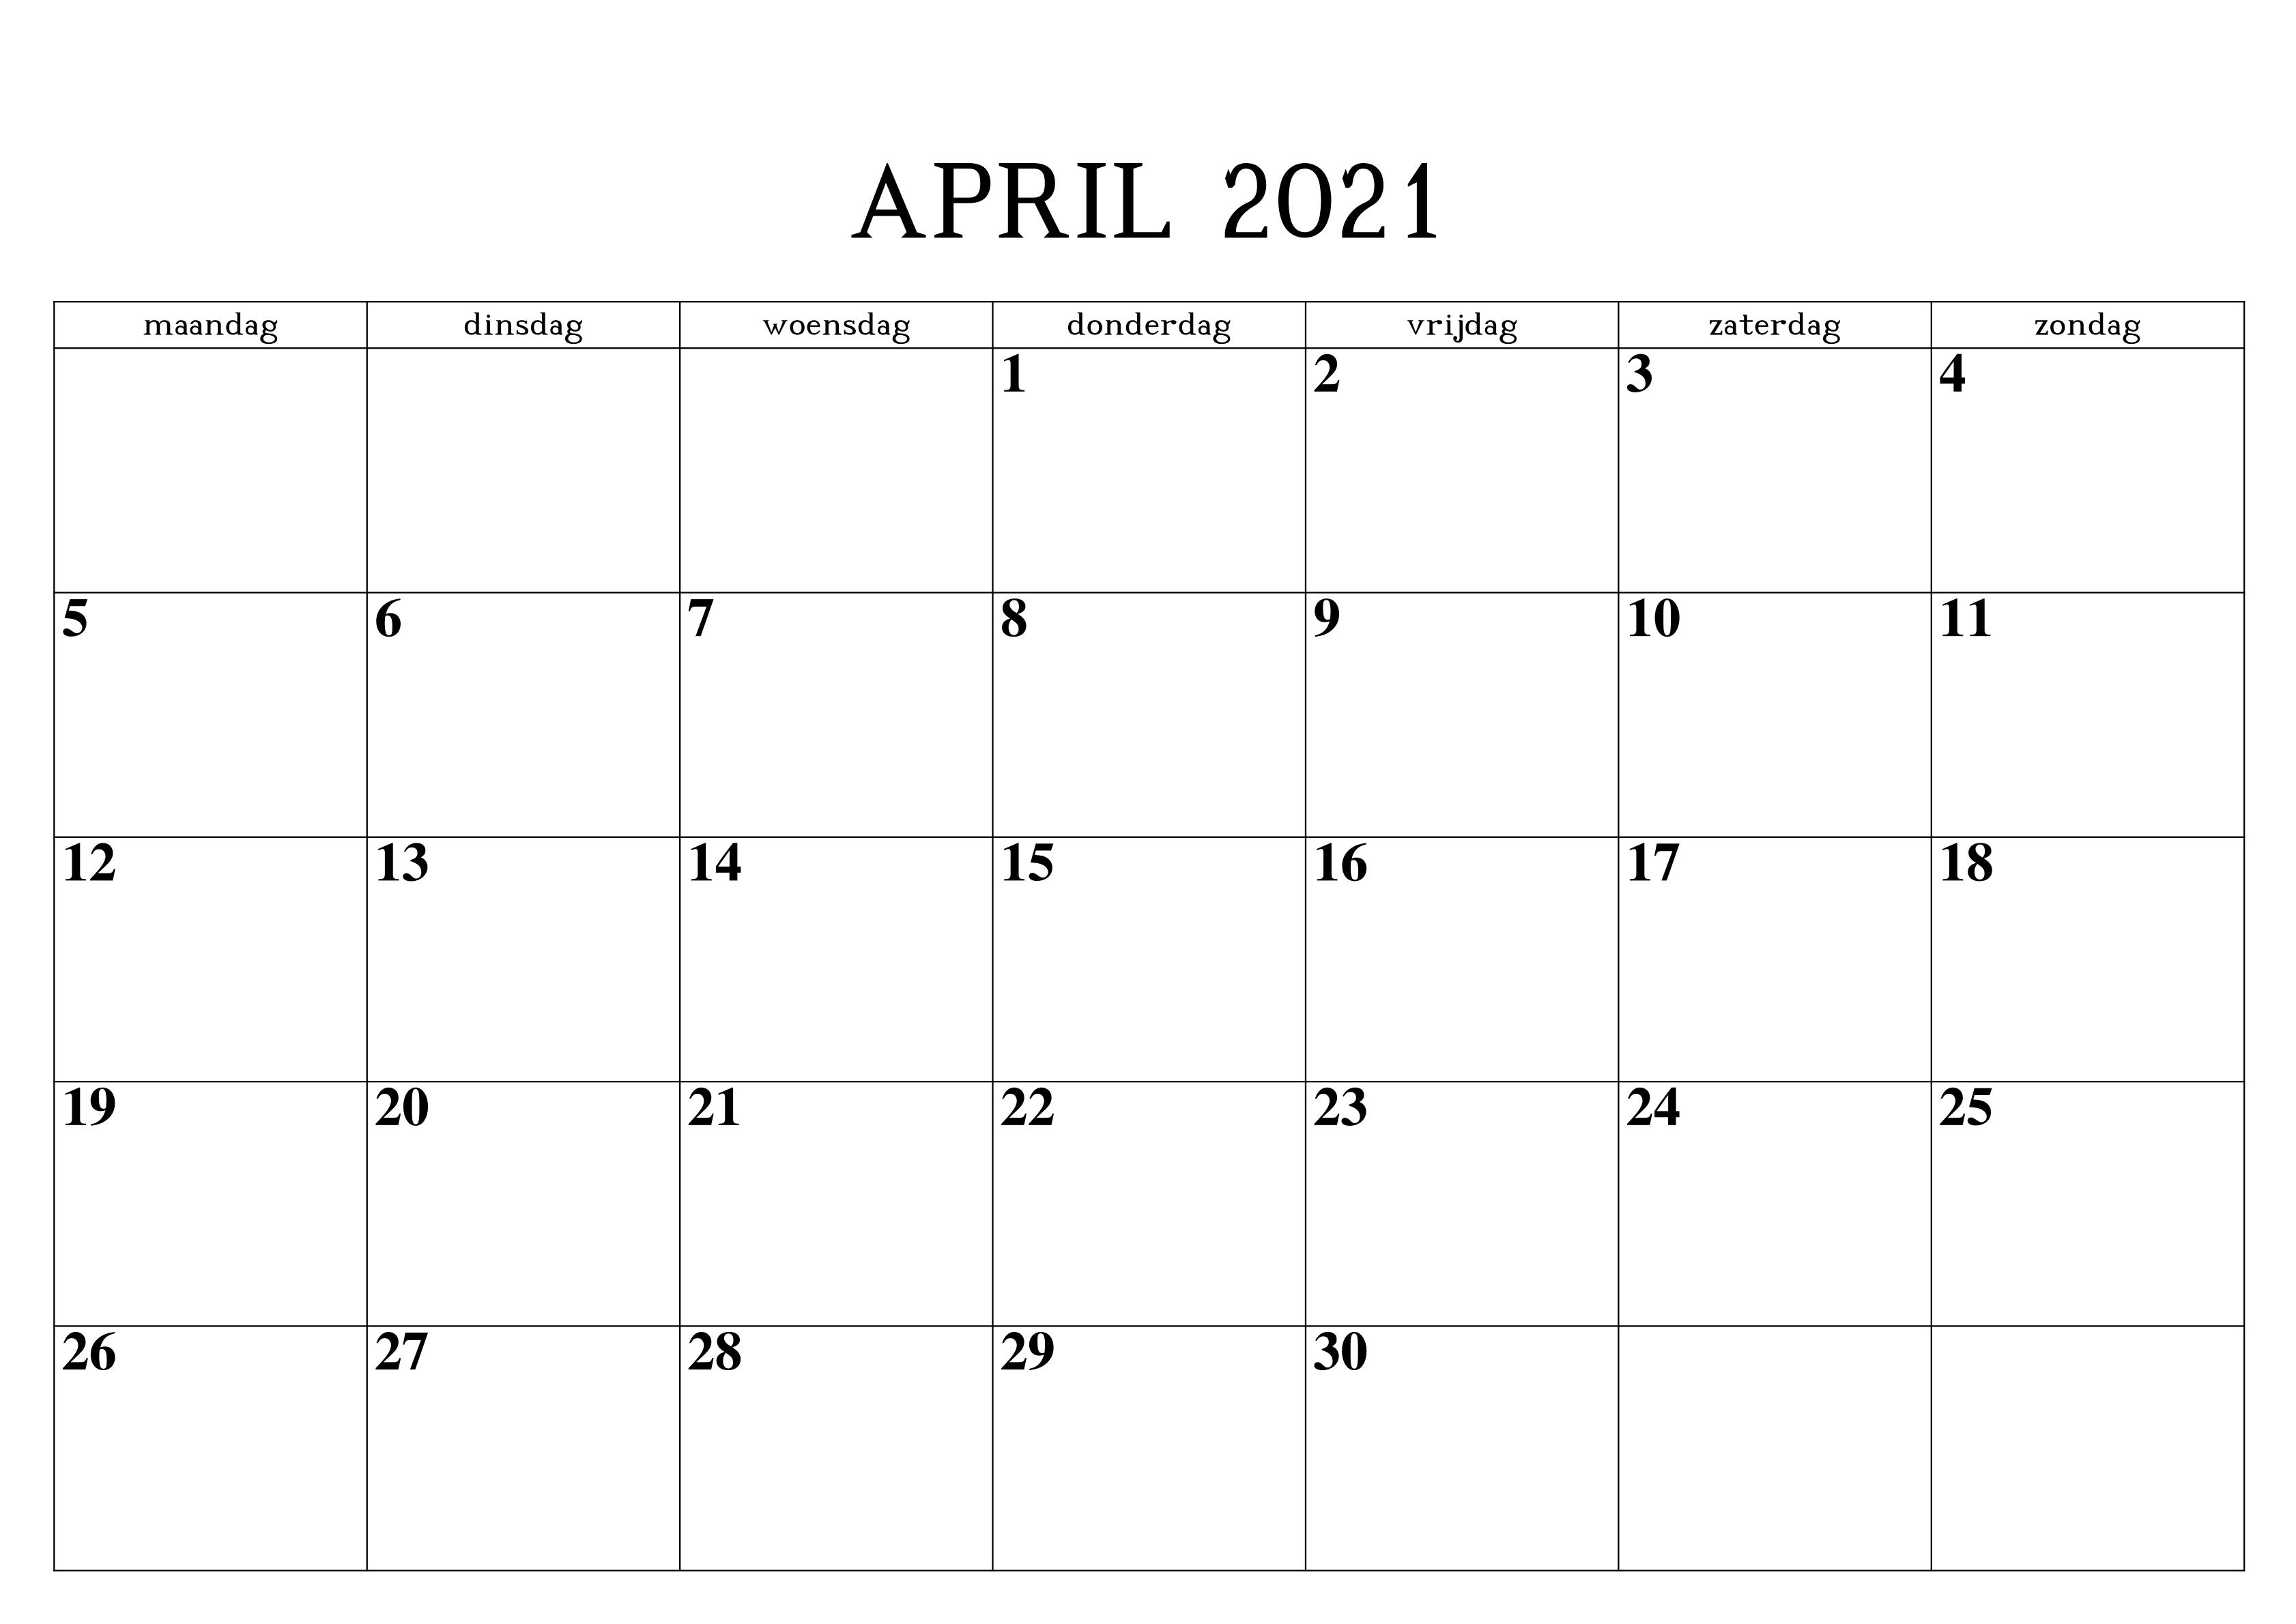 Monats Kalender April 2021